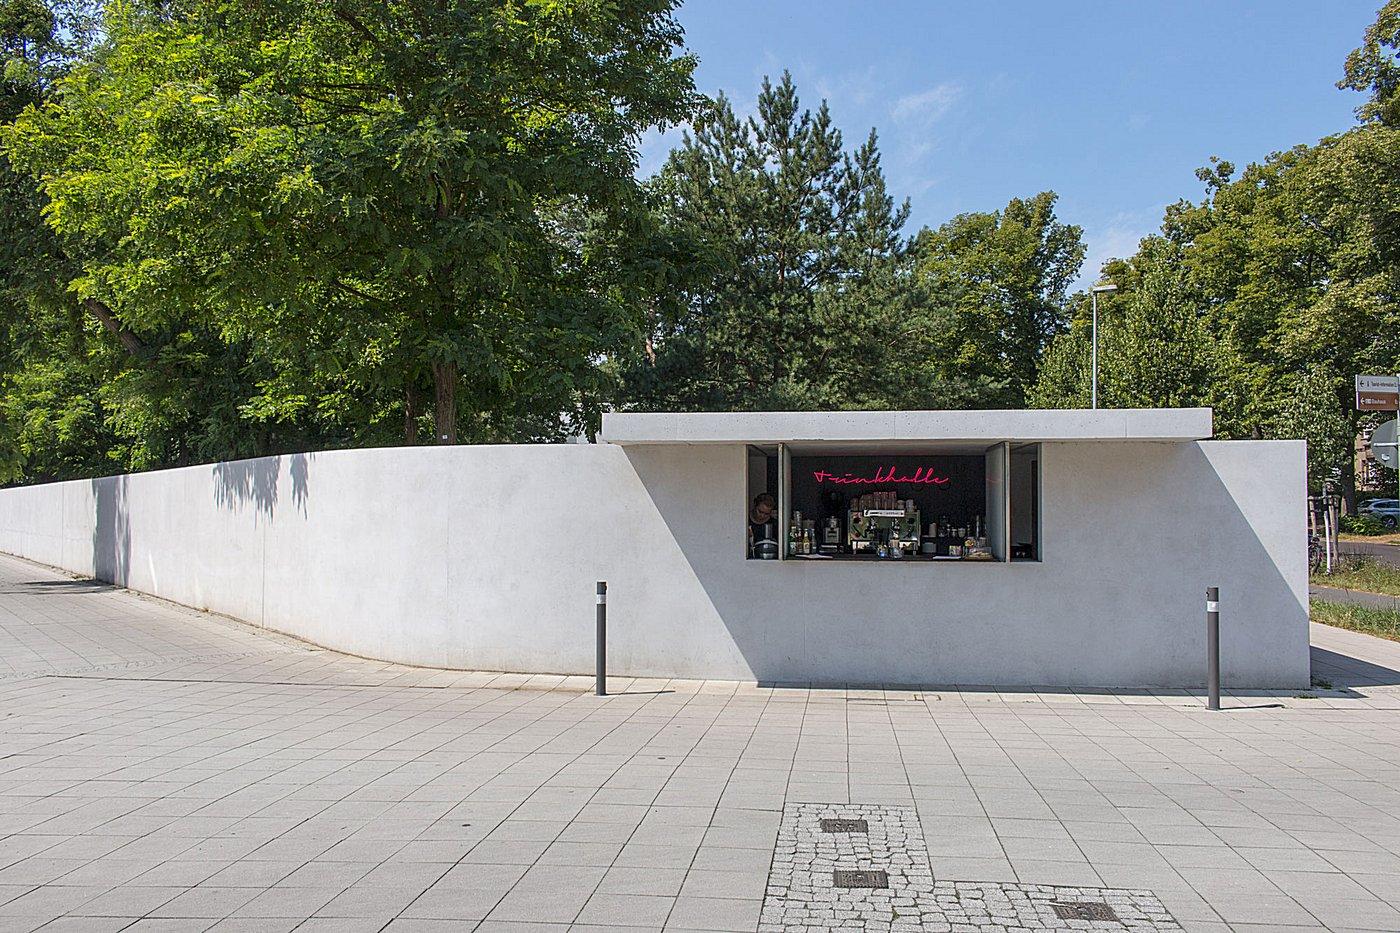 Gastronomie Stiftung Bauhaus Dessau Bauhaus Dessau